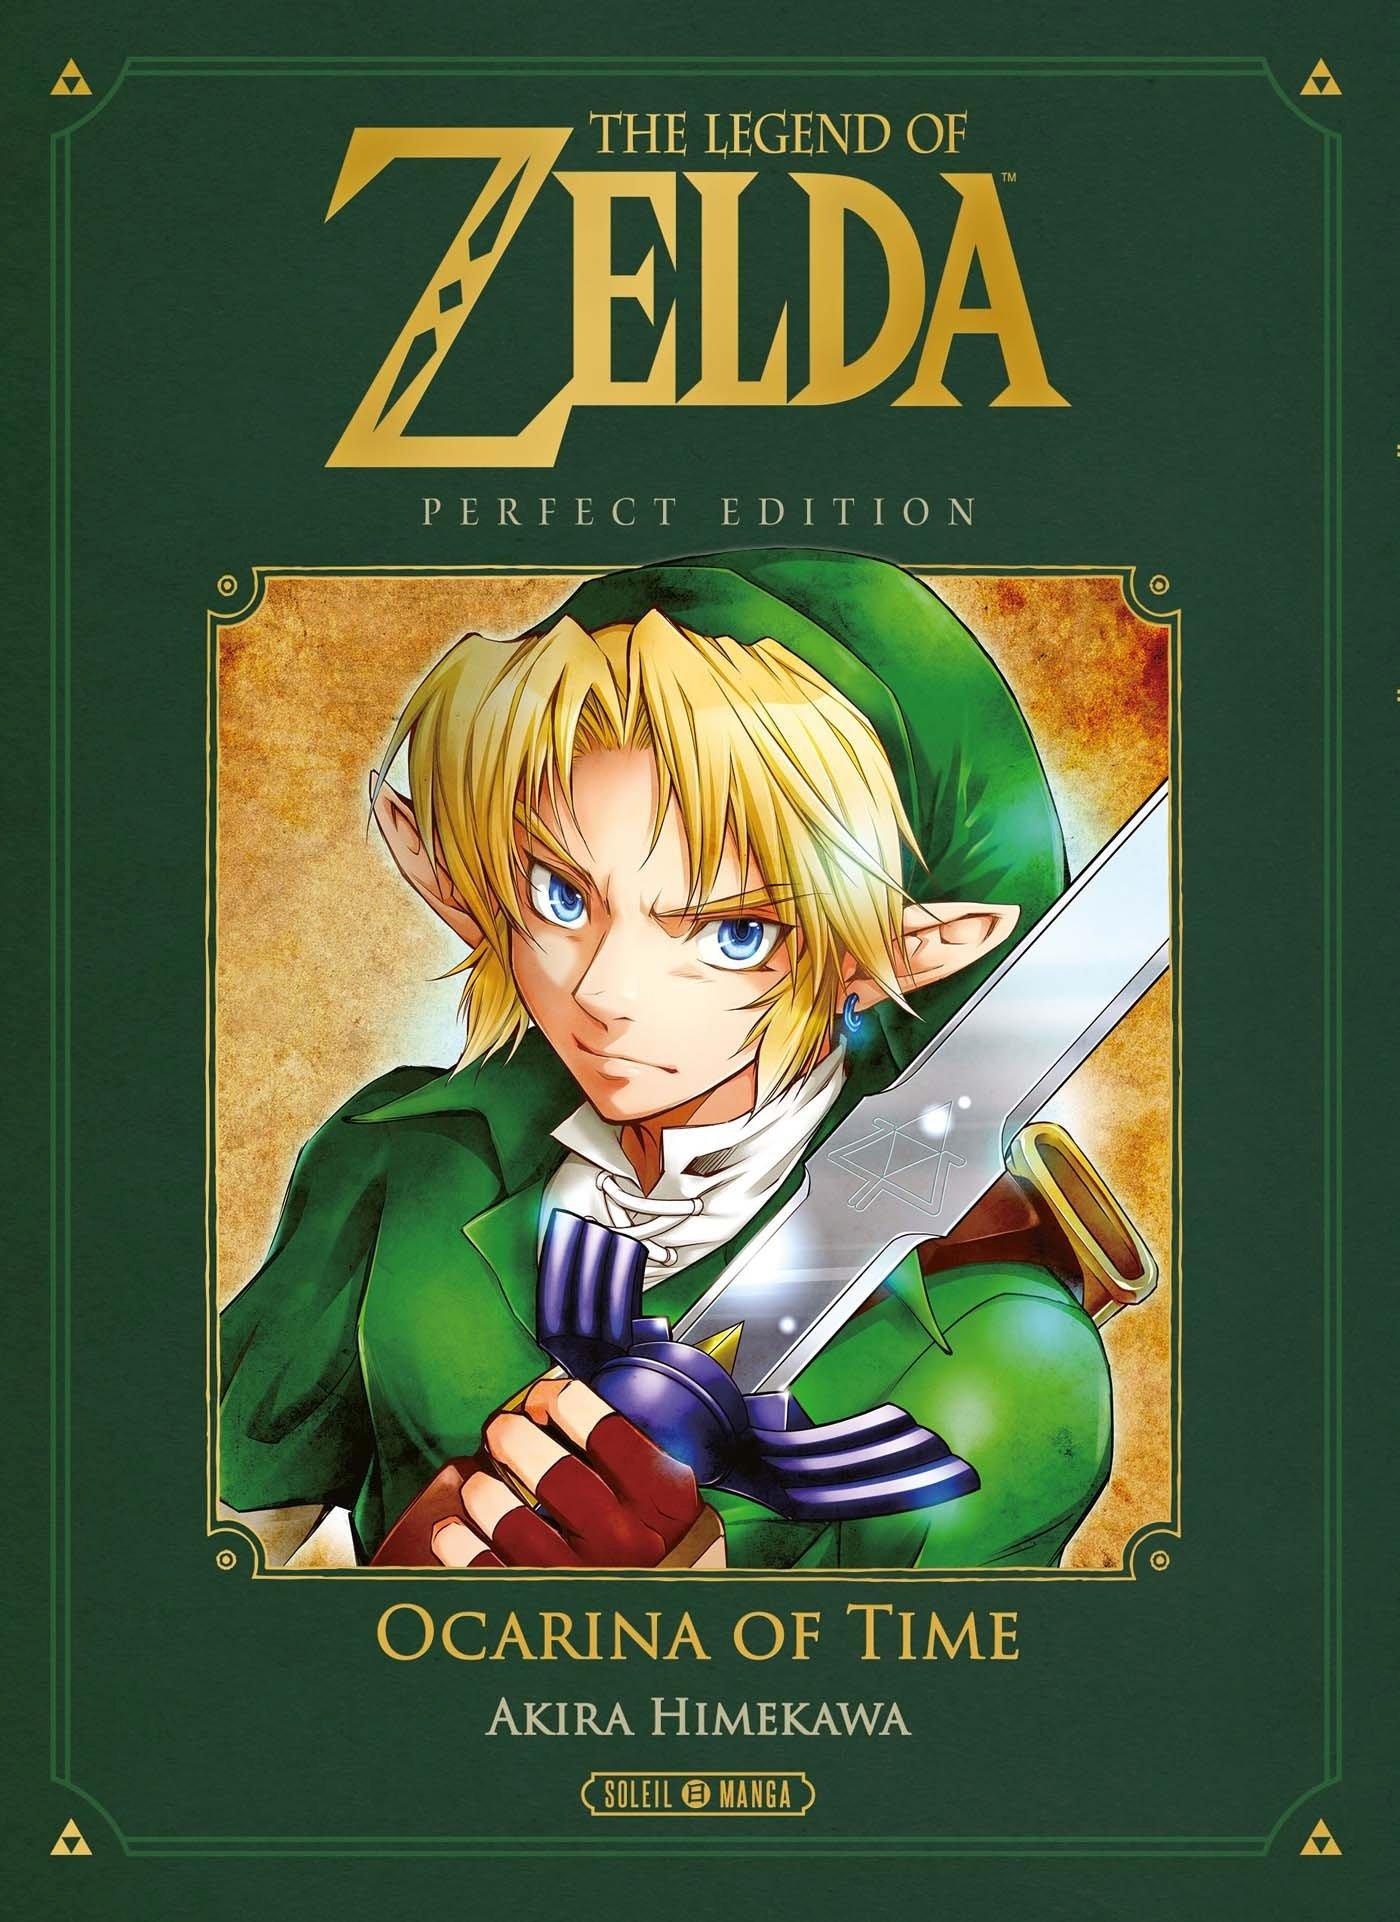 The Legend of Zelda: Ocarina of Time Manga